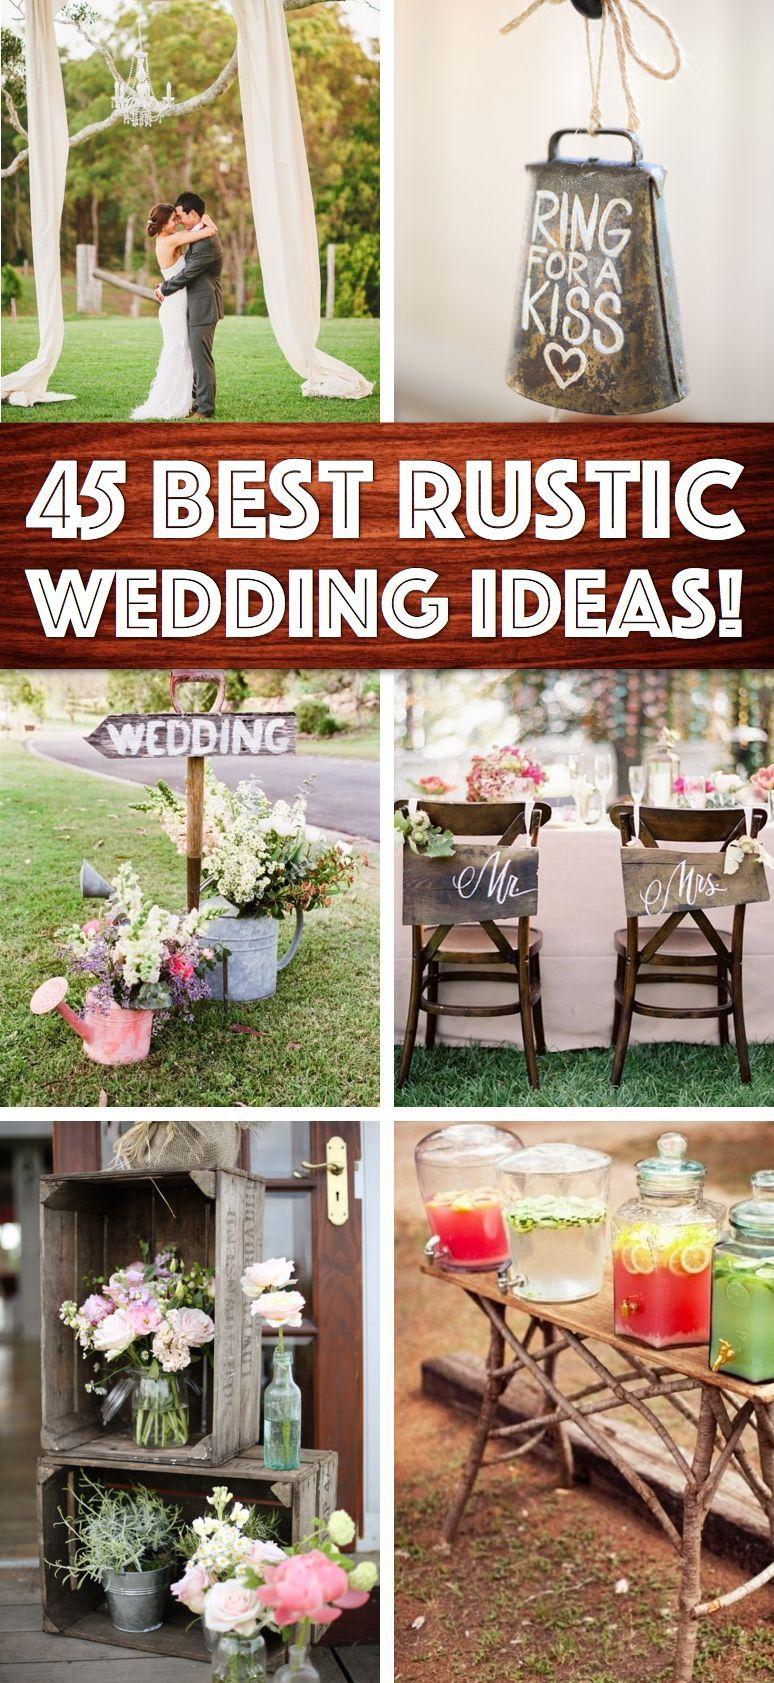 500 Most Popular Wedding Ideas On Pinterest My Wedding